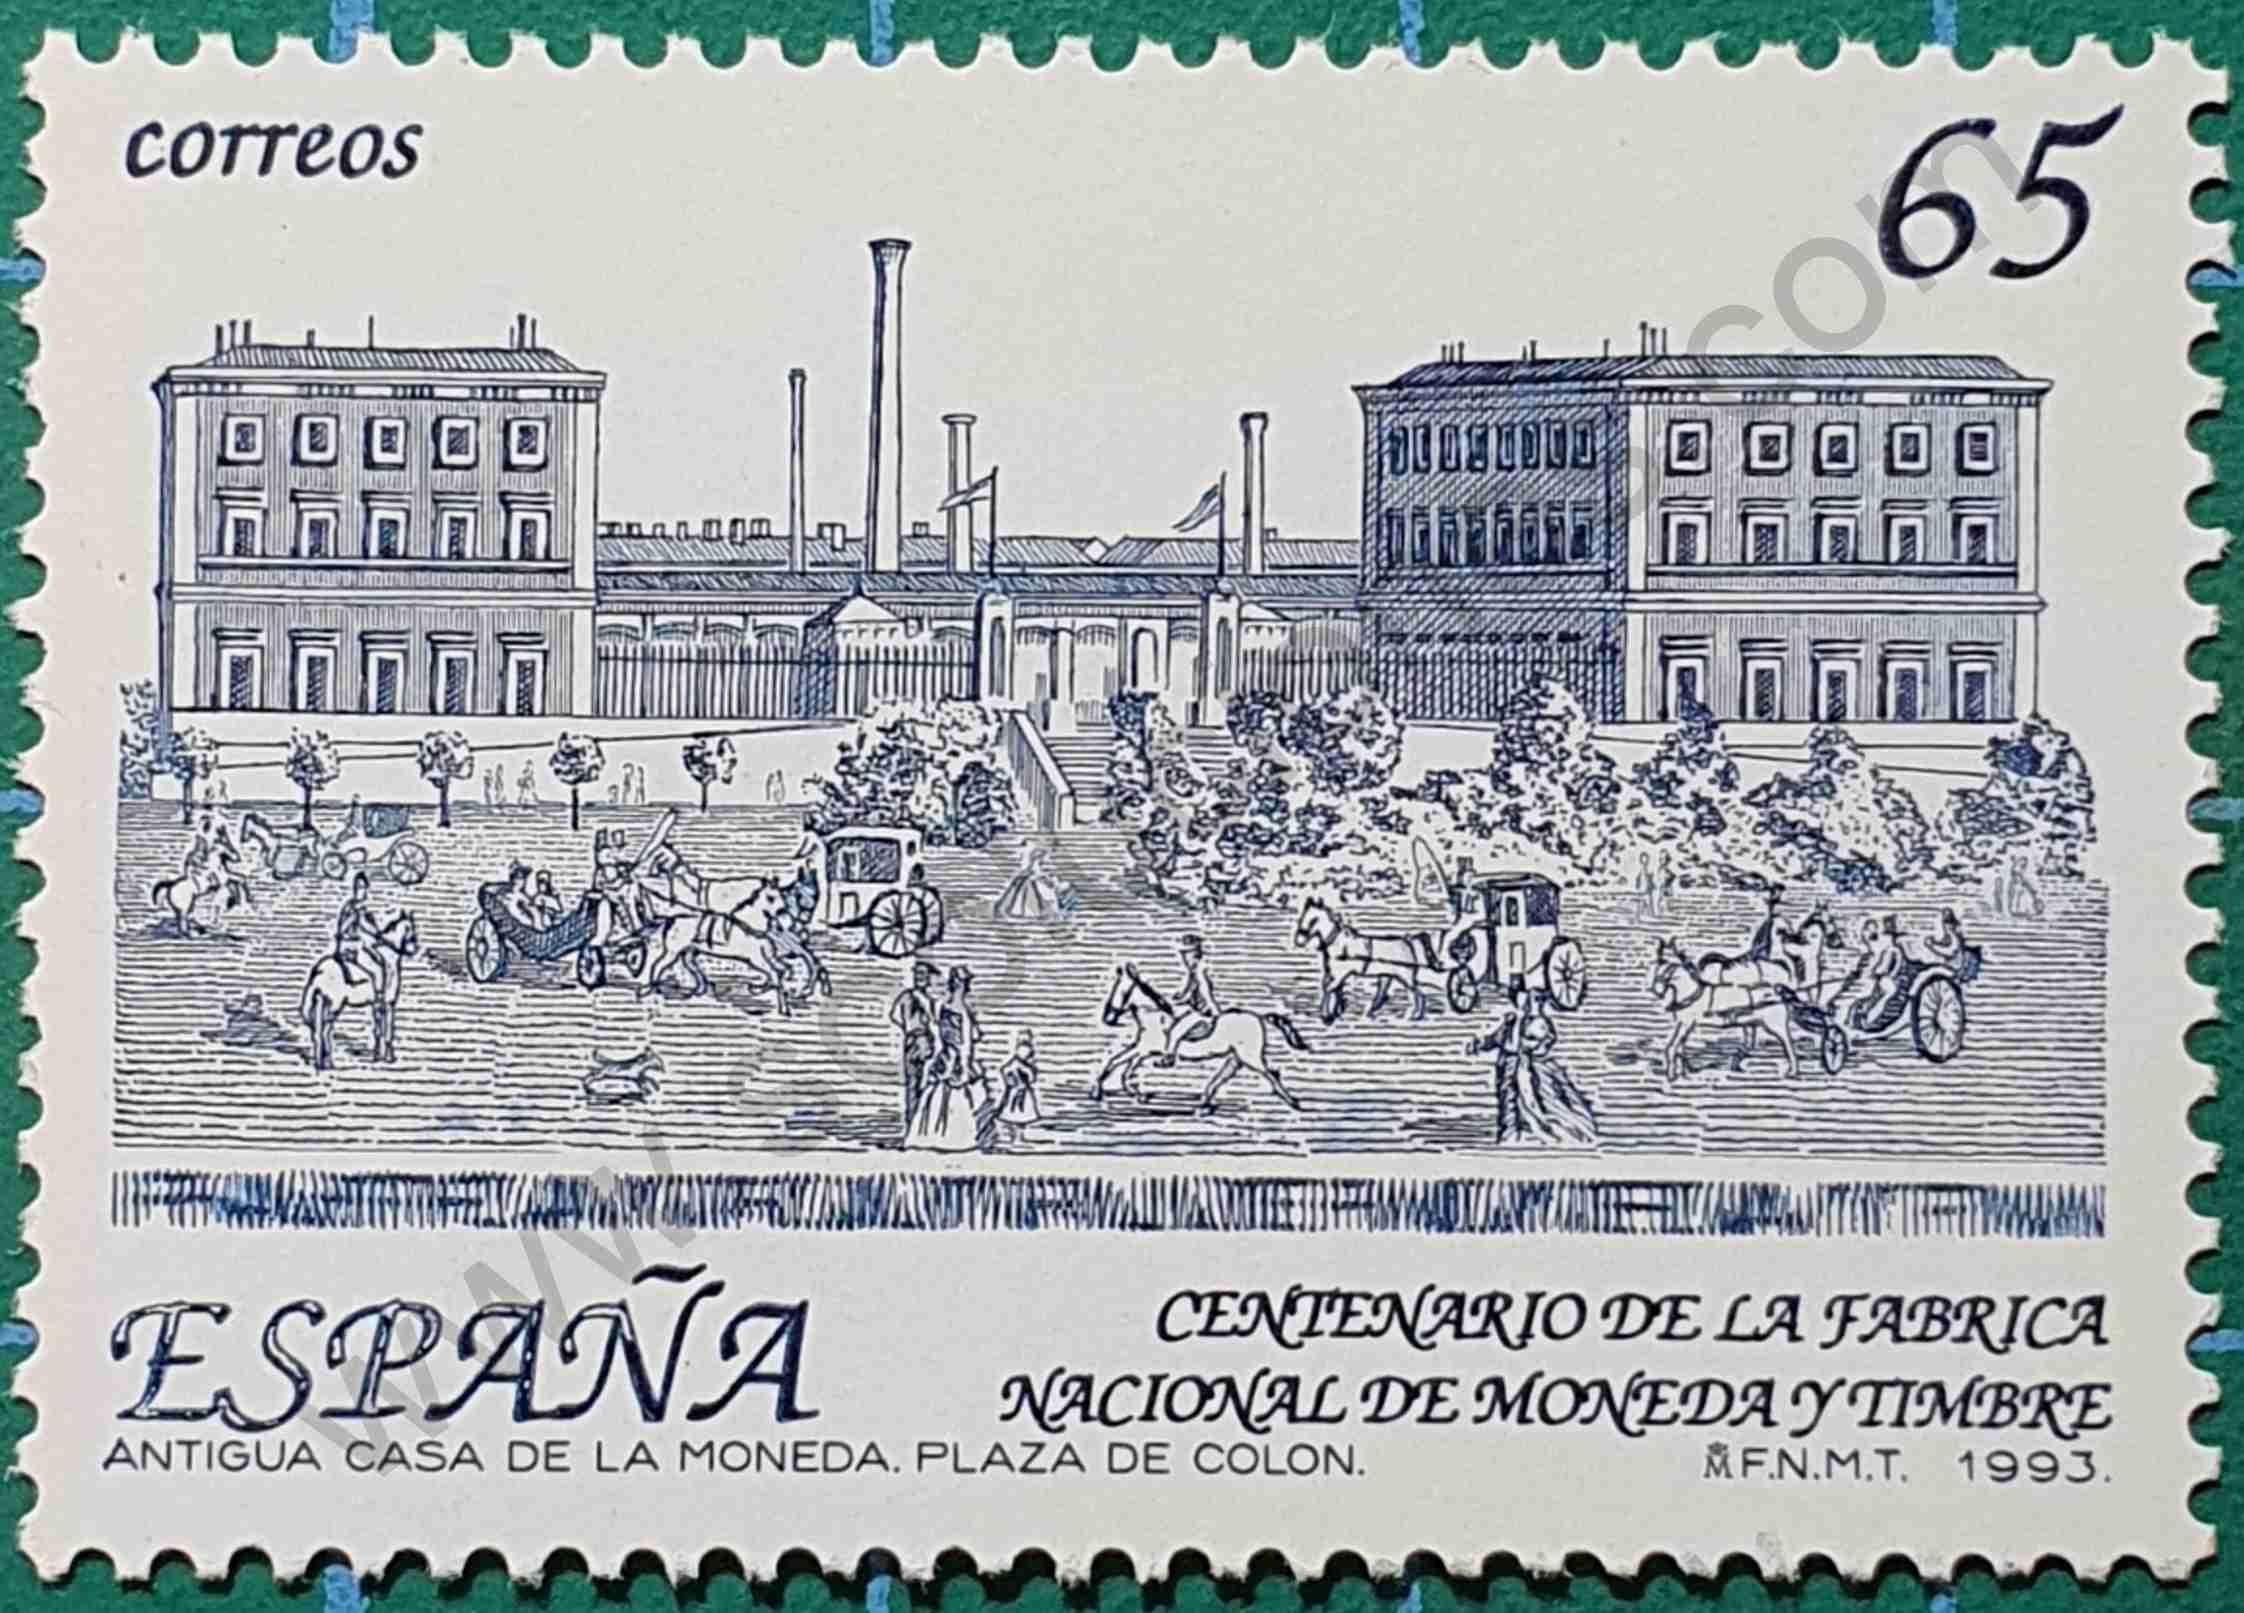 Fábrica Nacional de Moneda y Timbres - sello España 1993